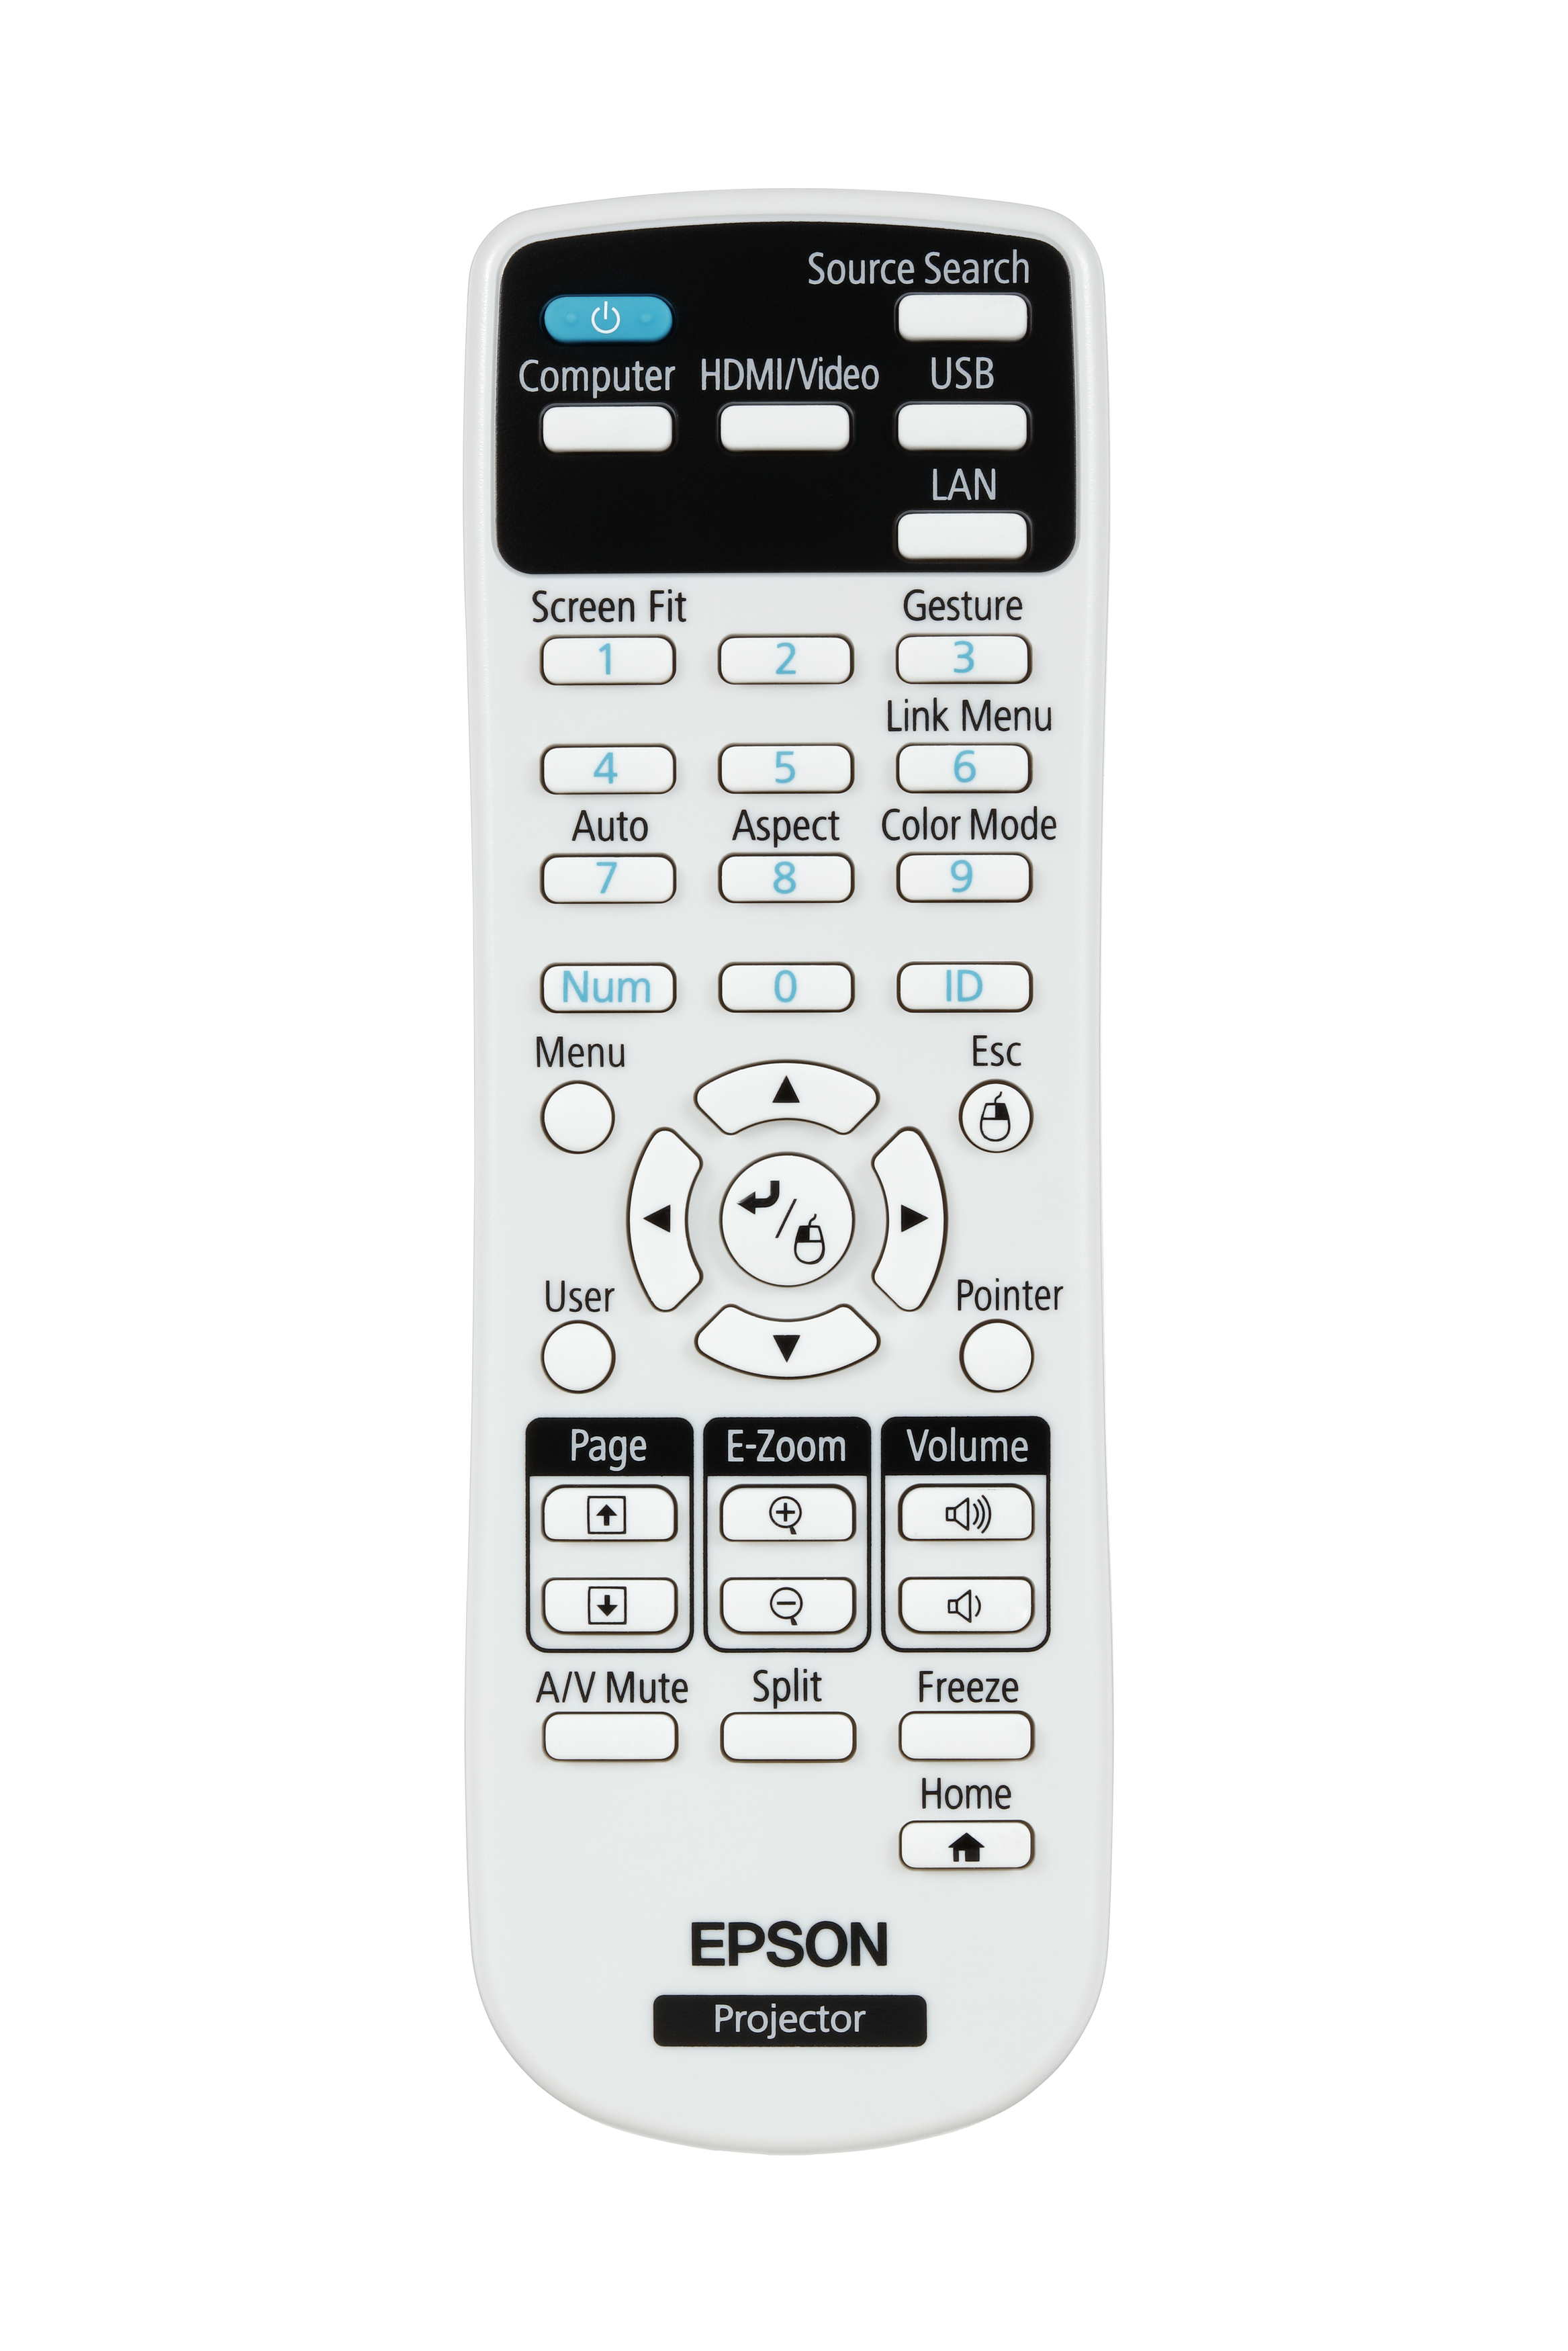 EB-2265U LCD projector (5500 lumens, WUXGA 1920 x 1200, 16:10, HD 1080p, 802.11n wireless, LAN, Miracast)